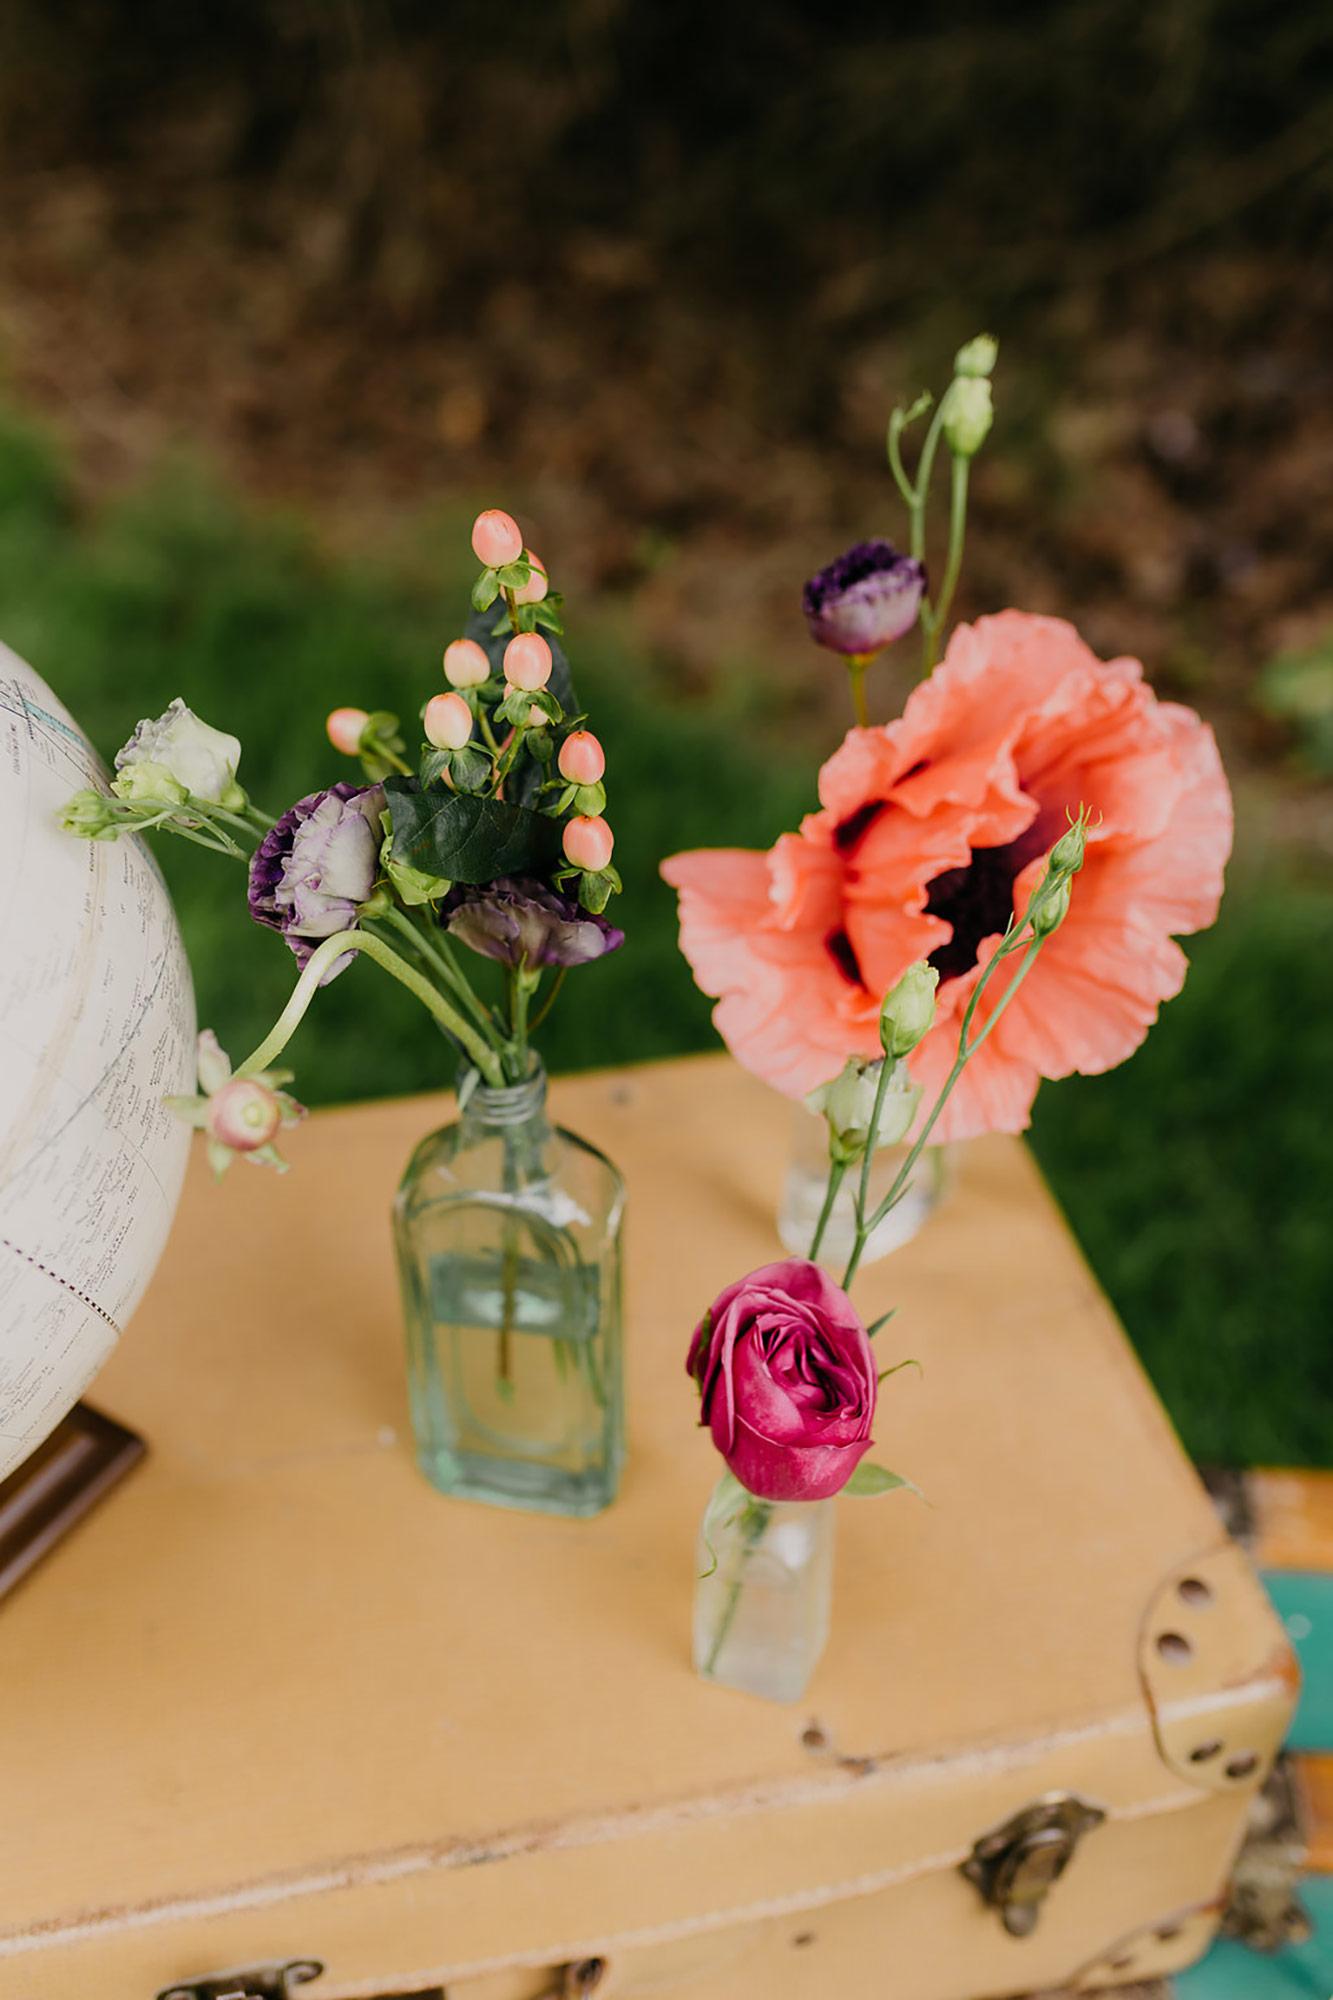 Kurtz-Orchards-Wedding-Niagara-wedding-Vineyard-Bride-Photography-by-Kayla-Rocca-017.JPG